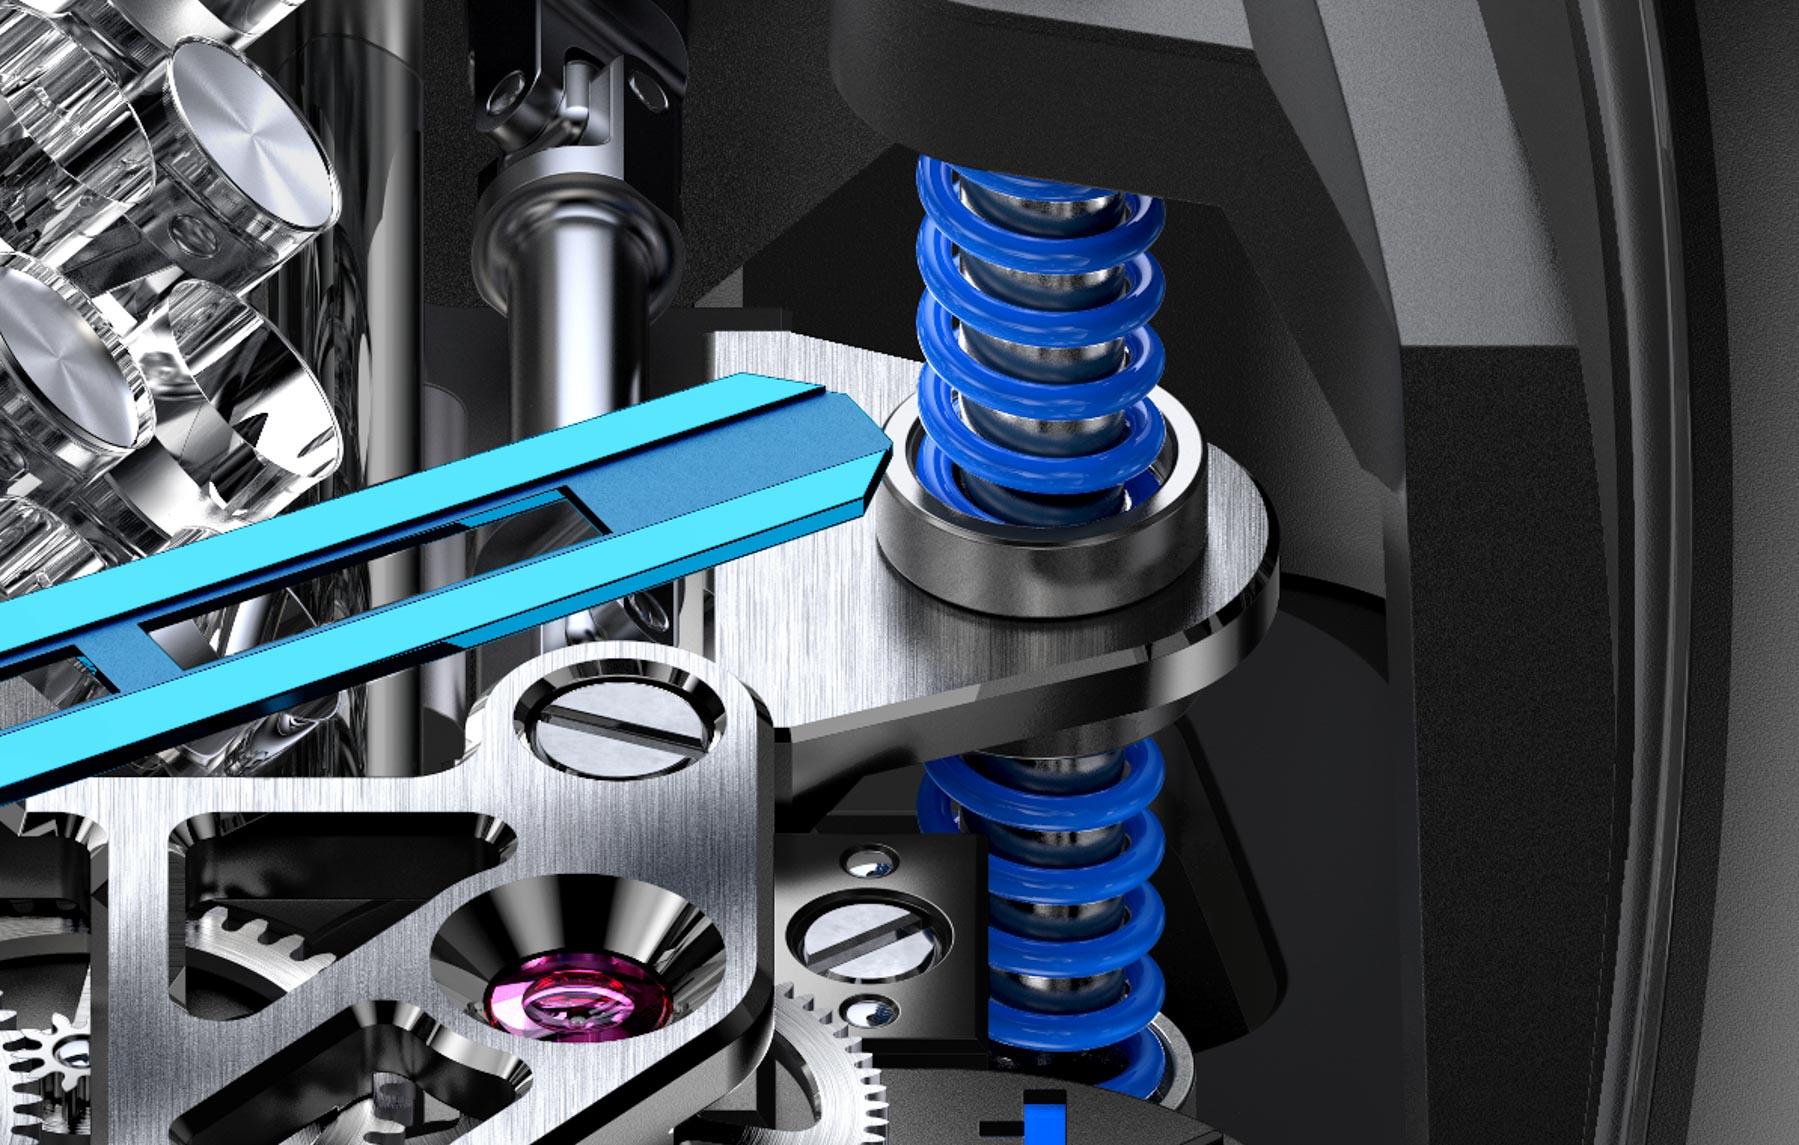 Jacob Co Bugatti Chiron Tourbillon Watch W16 Engine Automaton Cars Automobiles Sapphire Tourbillon Engineering Watchmaking Innovation aBlogtoWatch 12